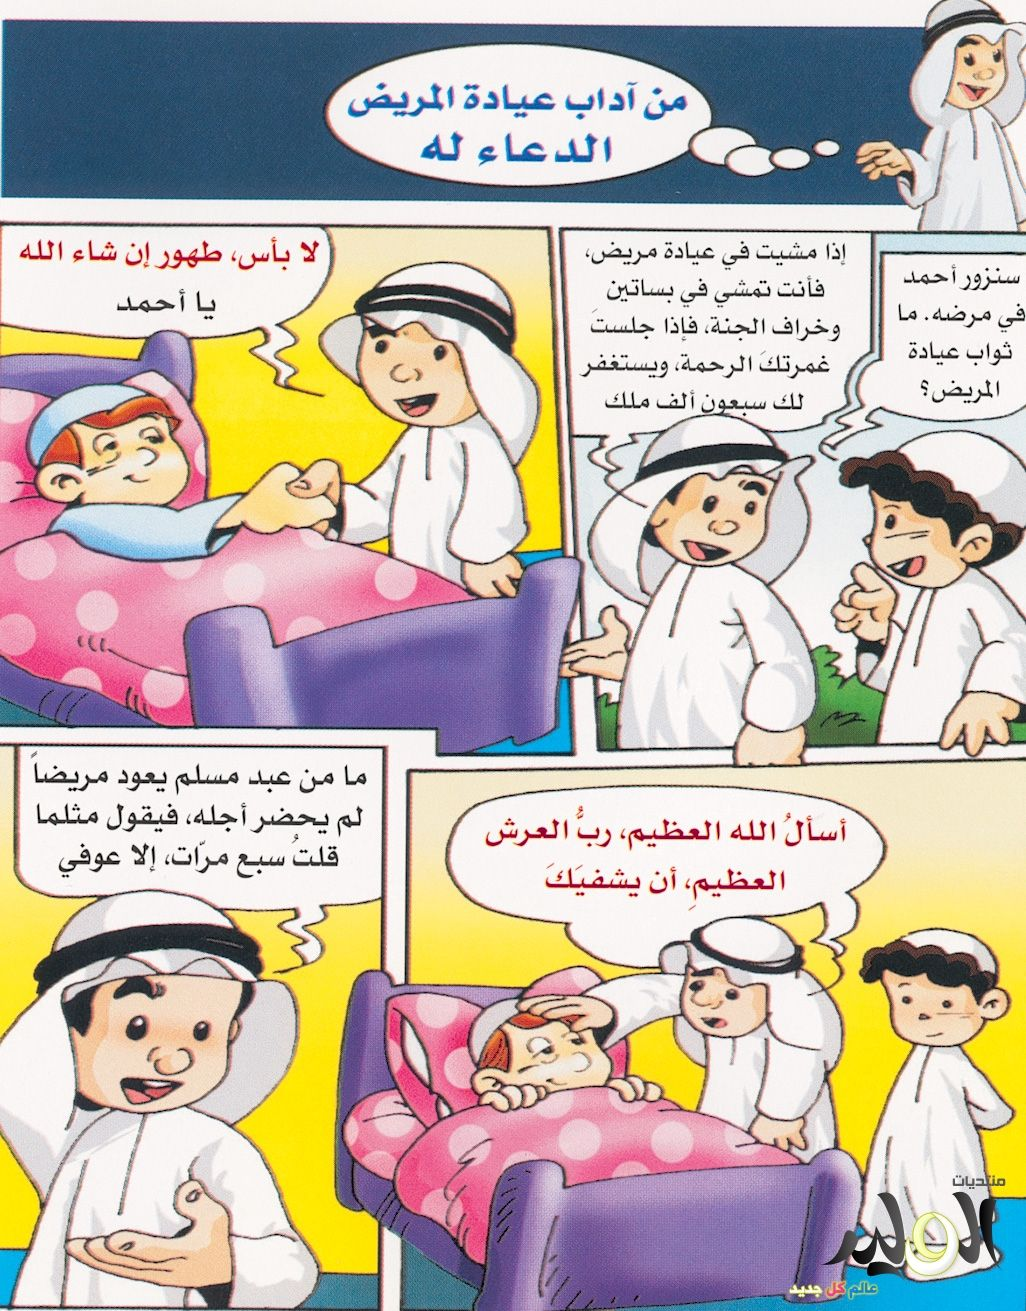 قصص اطفال دينية مصورة 2018 قصص اطفال اسلامية مصورة 2018 الوليد Islamic Kids Activities Islam For Kids Ramadan Activities